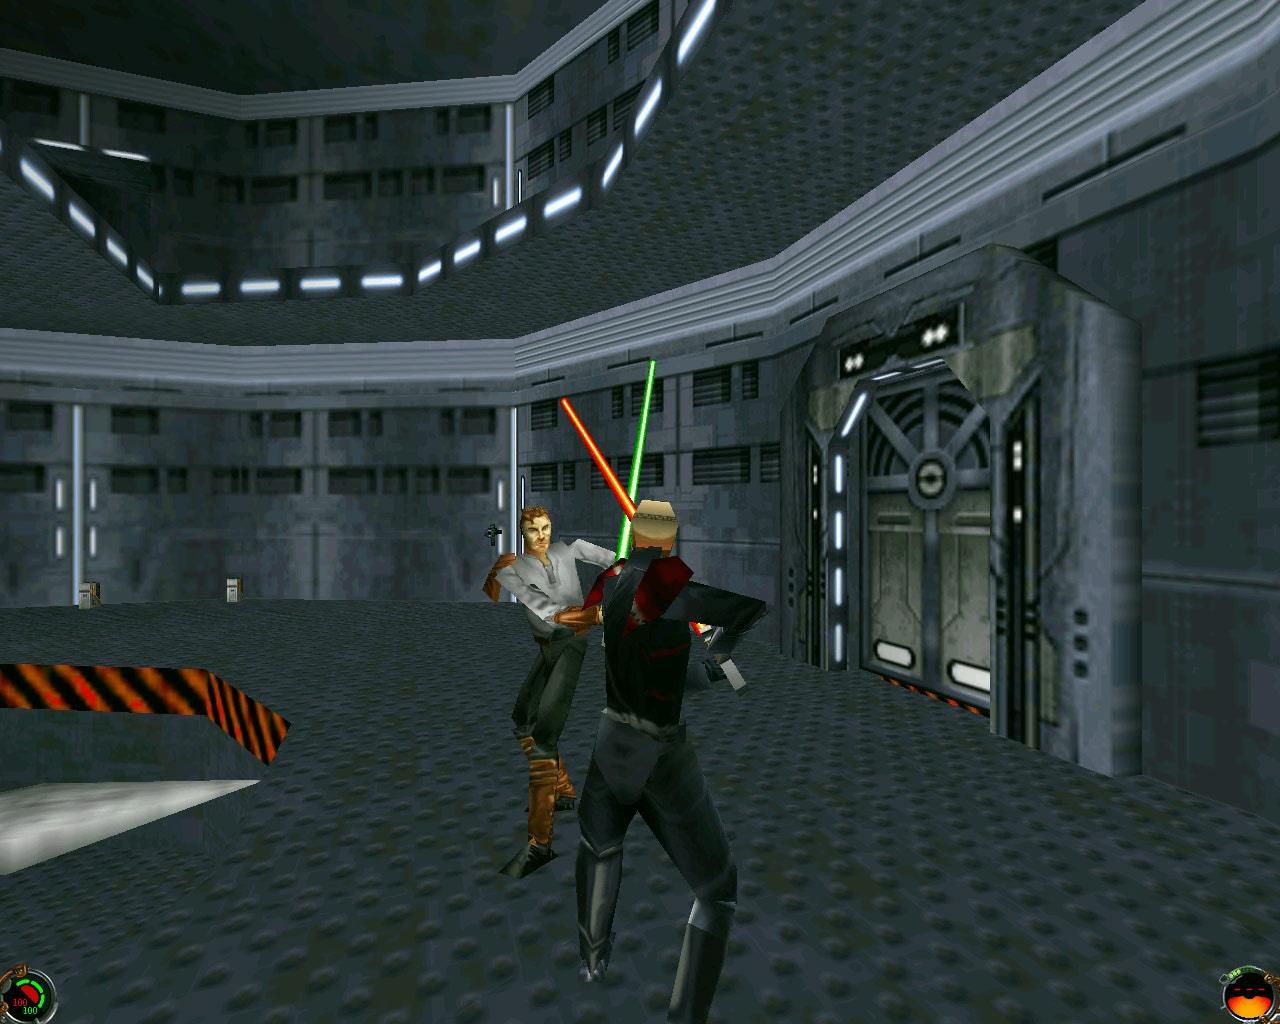 Star Wars Jedi Knight: Dark Forces II Steam Key GLOBAL - 3